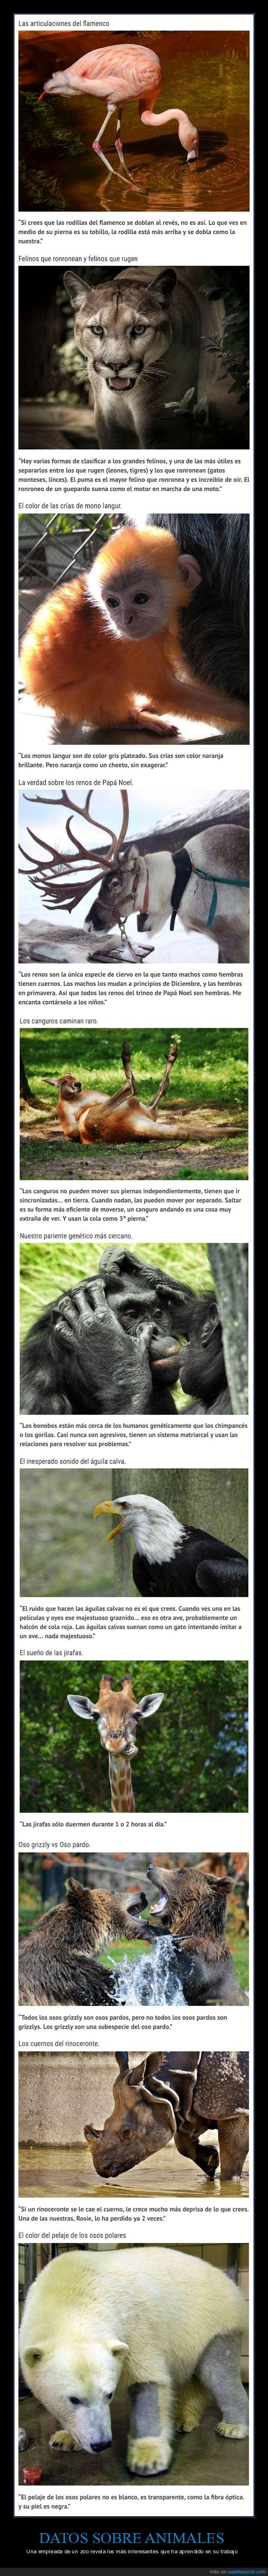 animales,curiosidades,datos,zoo